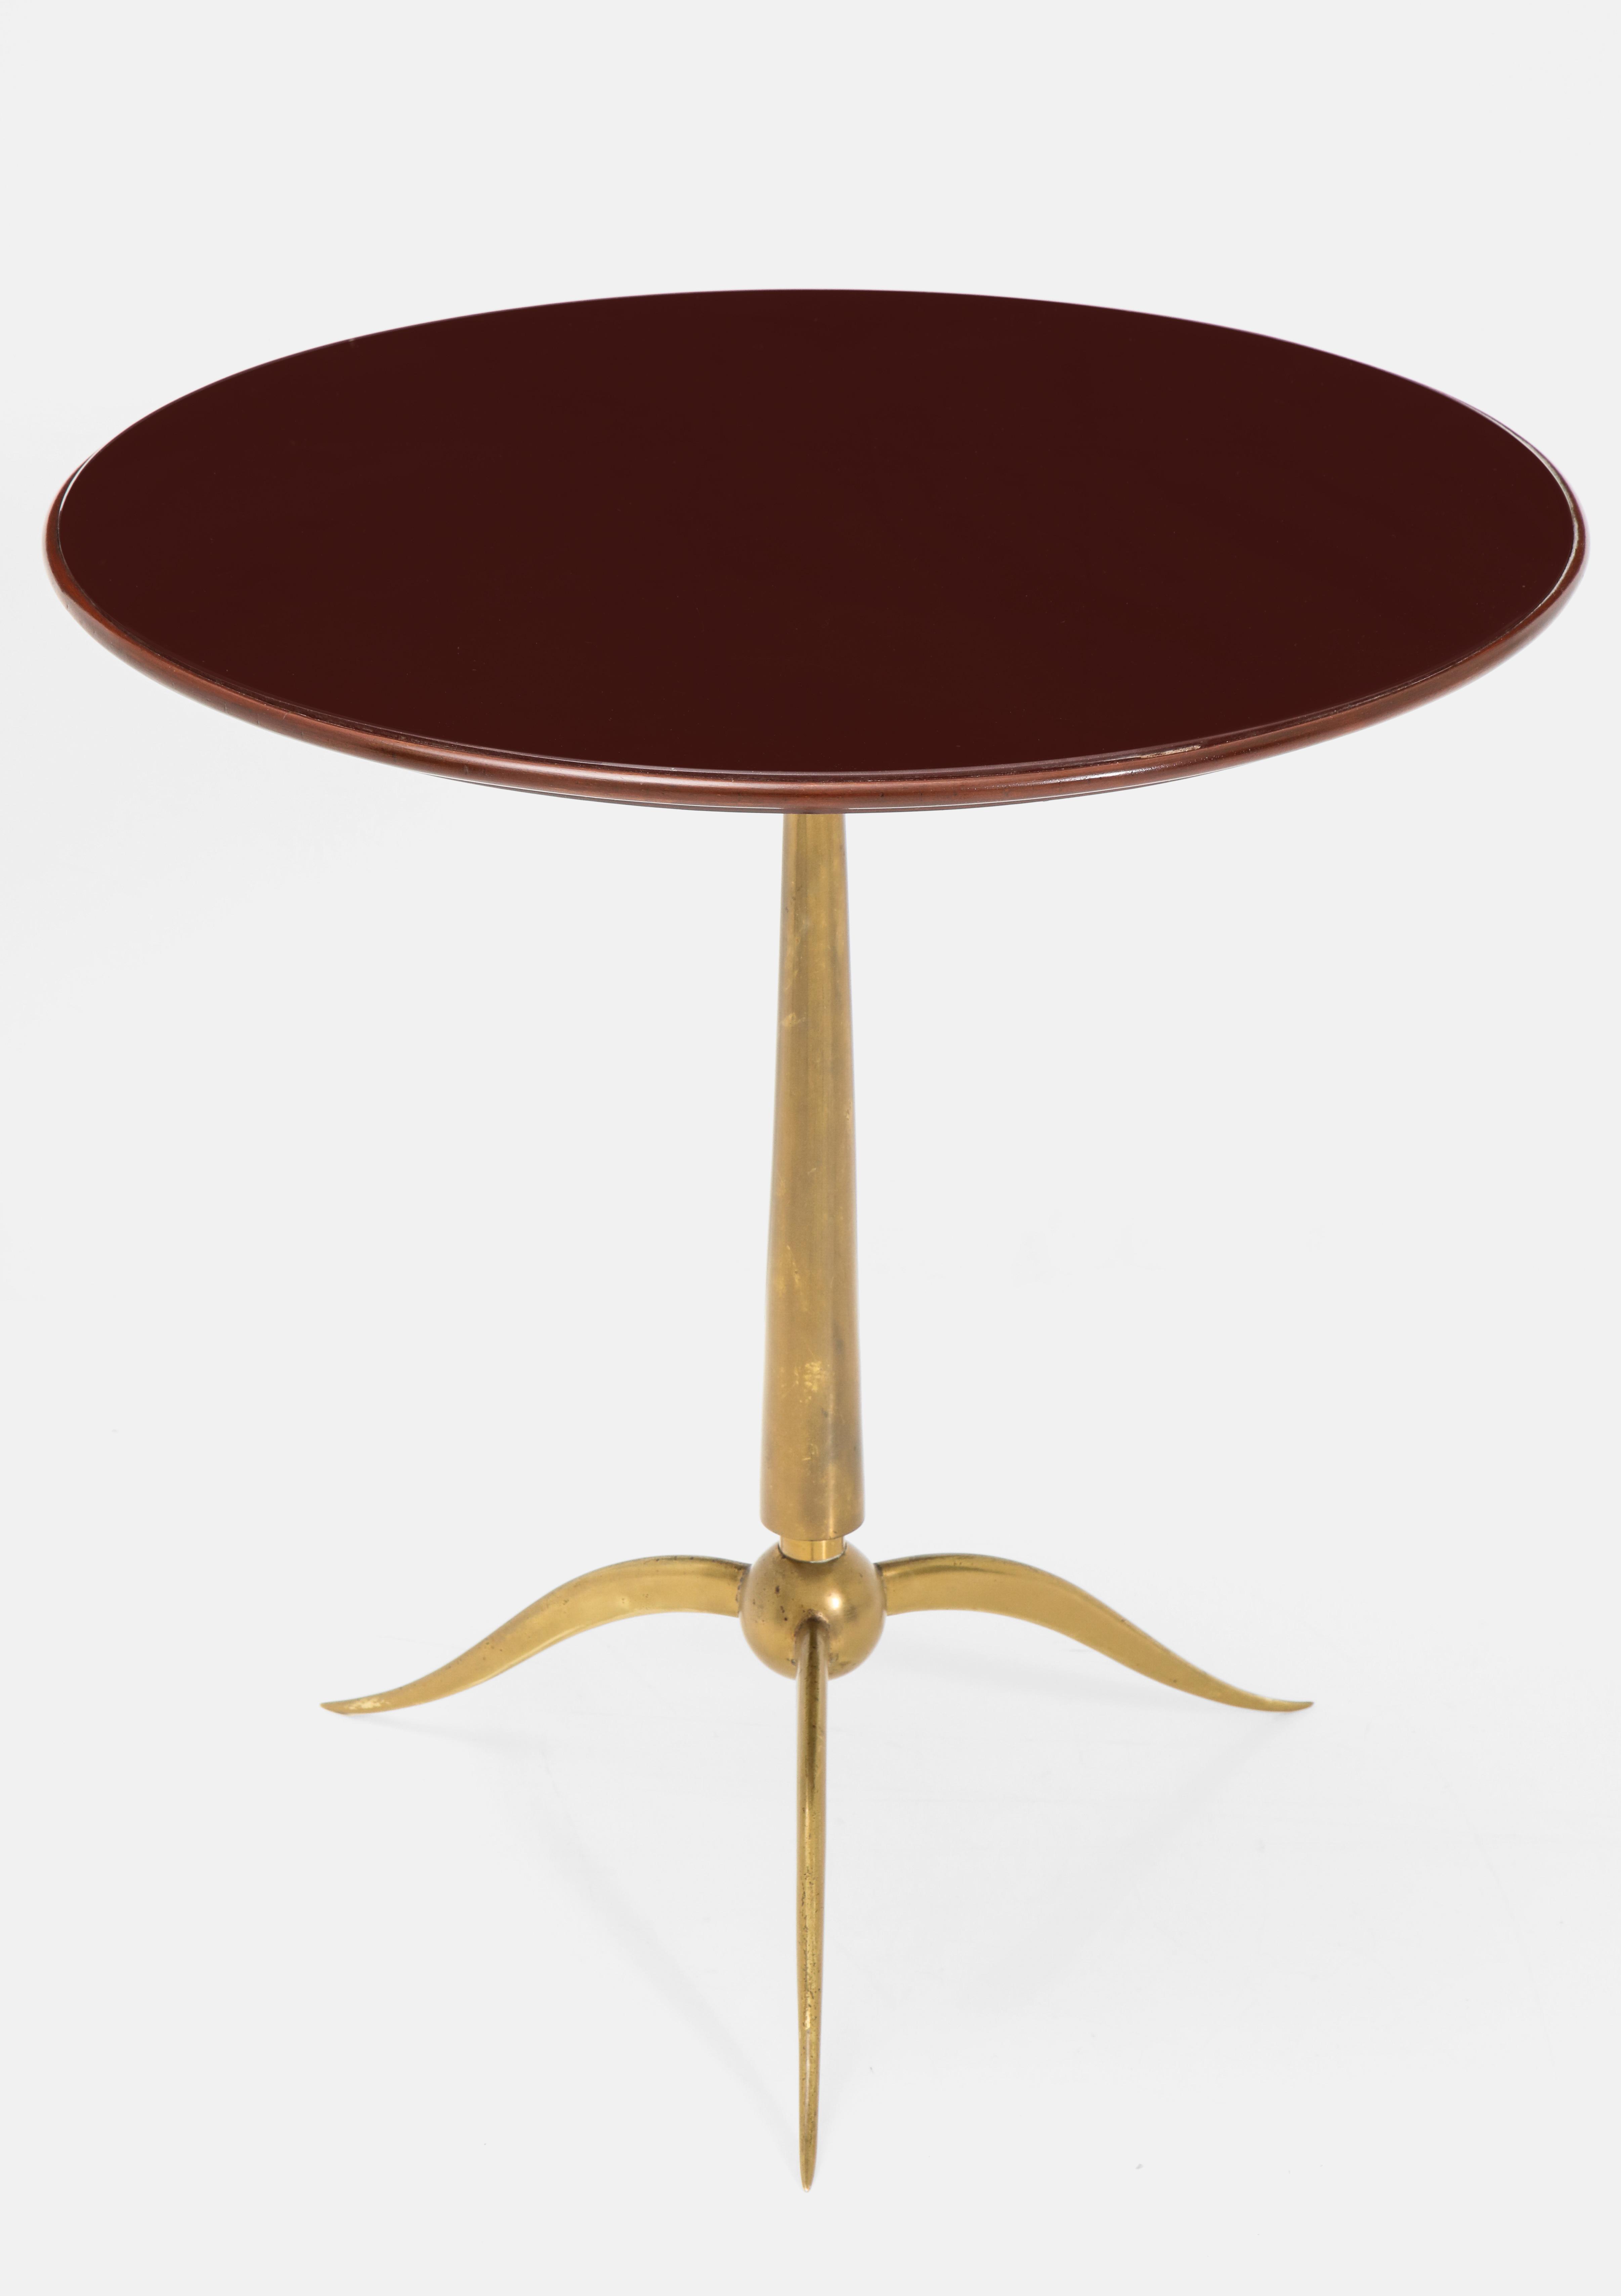 Rare Side Table by Osvaldo Borsani for Arredamenti Borsani | soyun k.